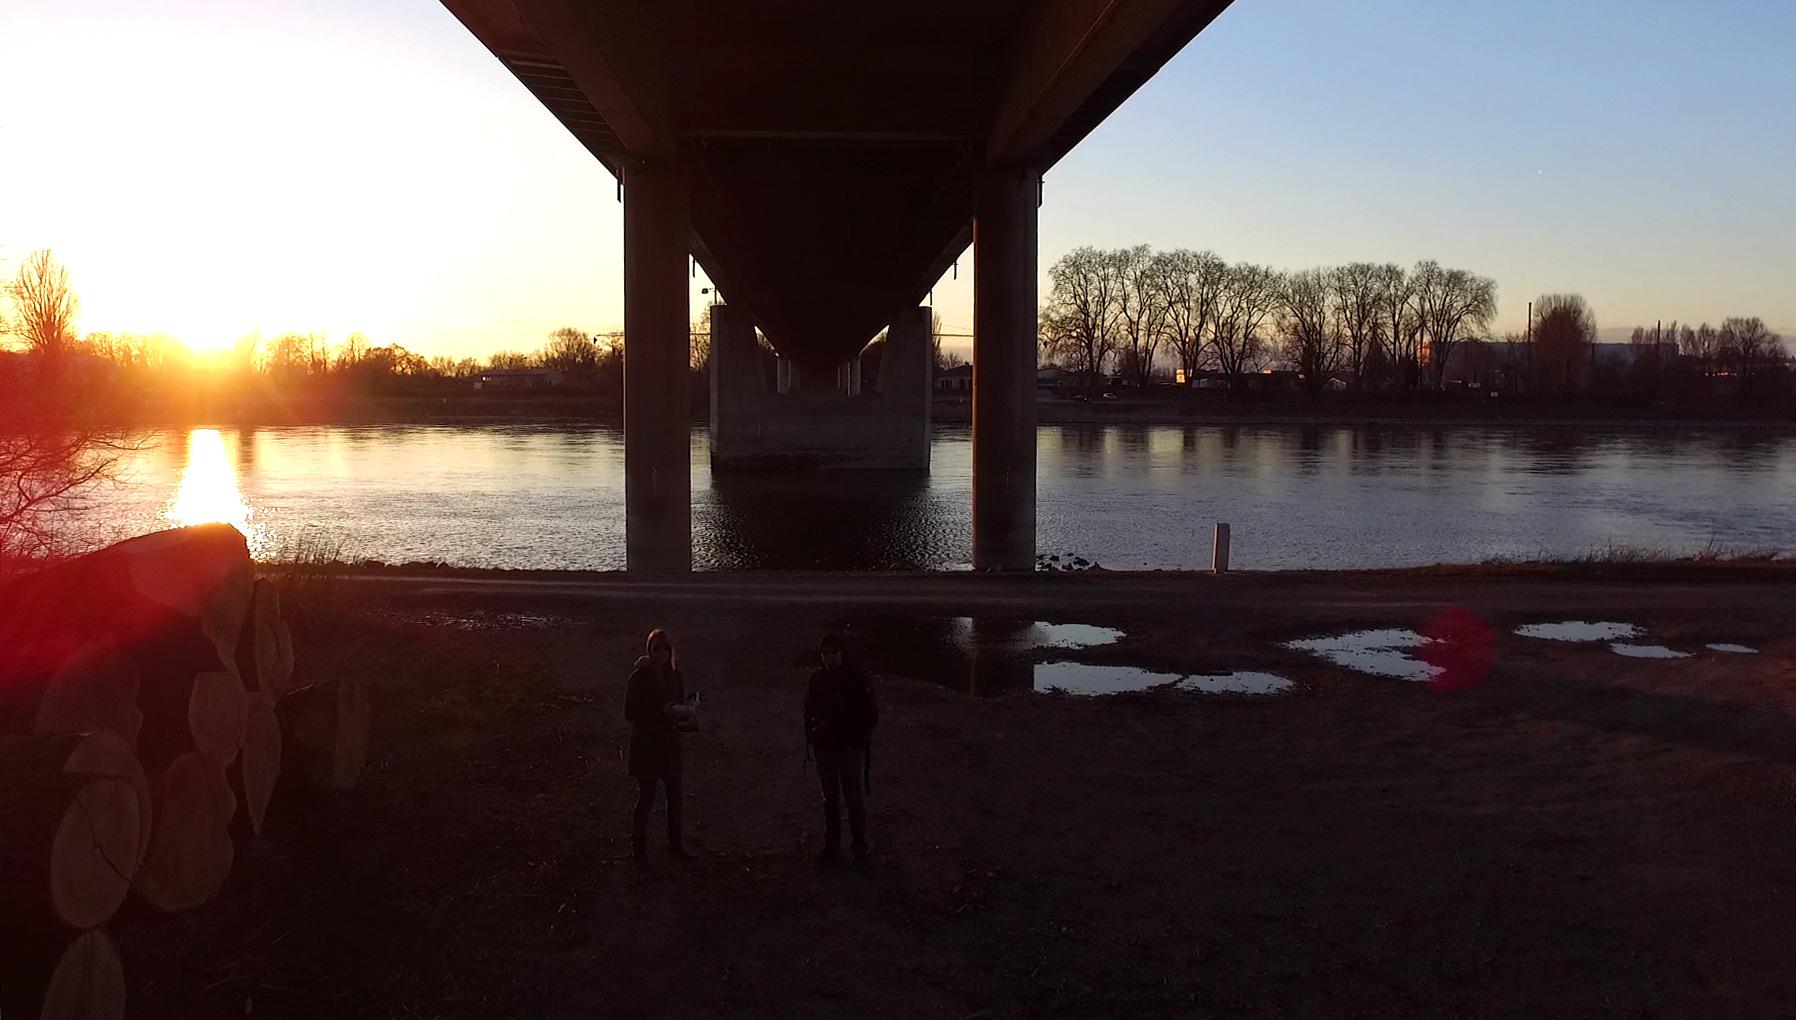 Drohnenselfie bei Sonnenuntergang